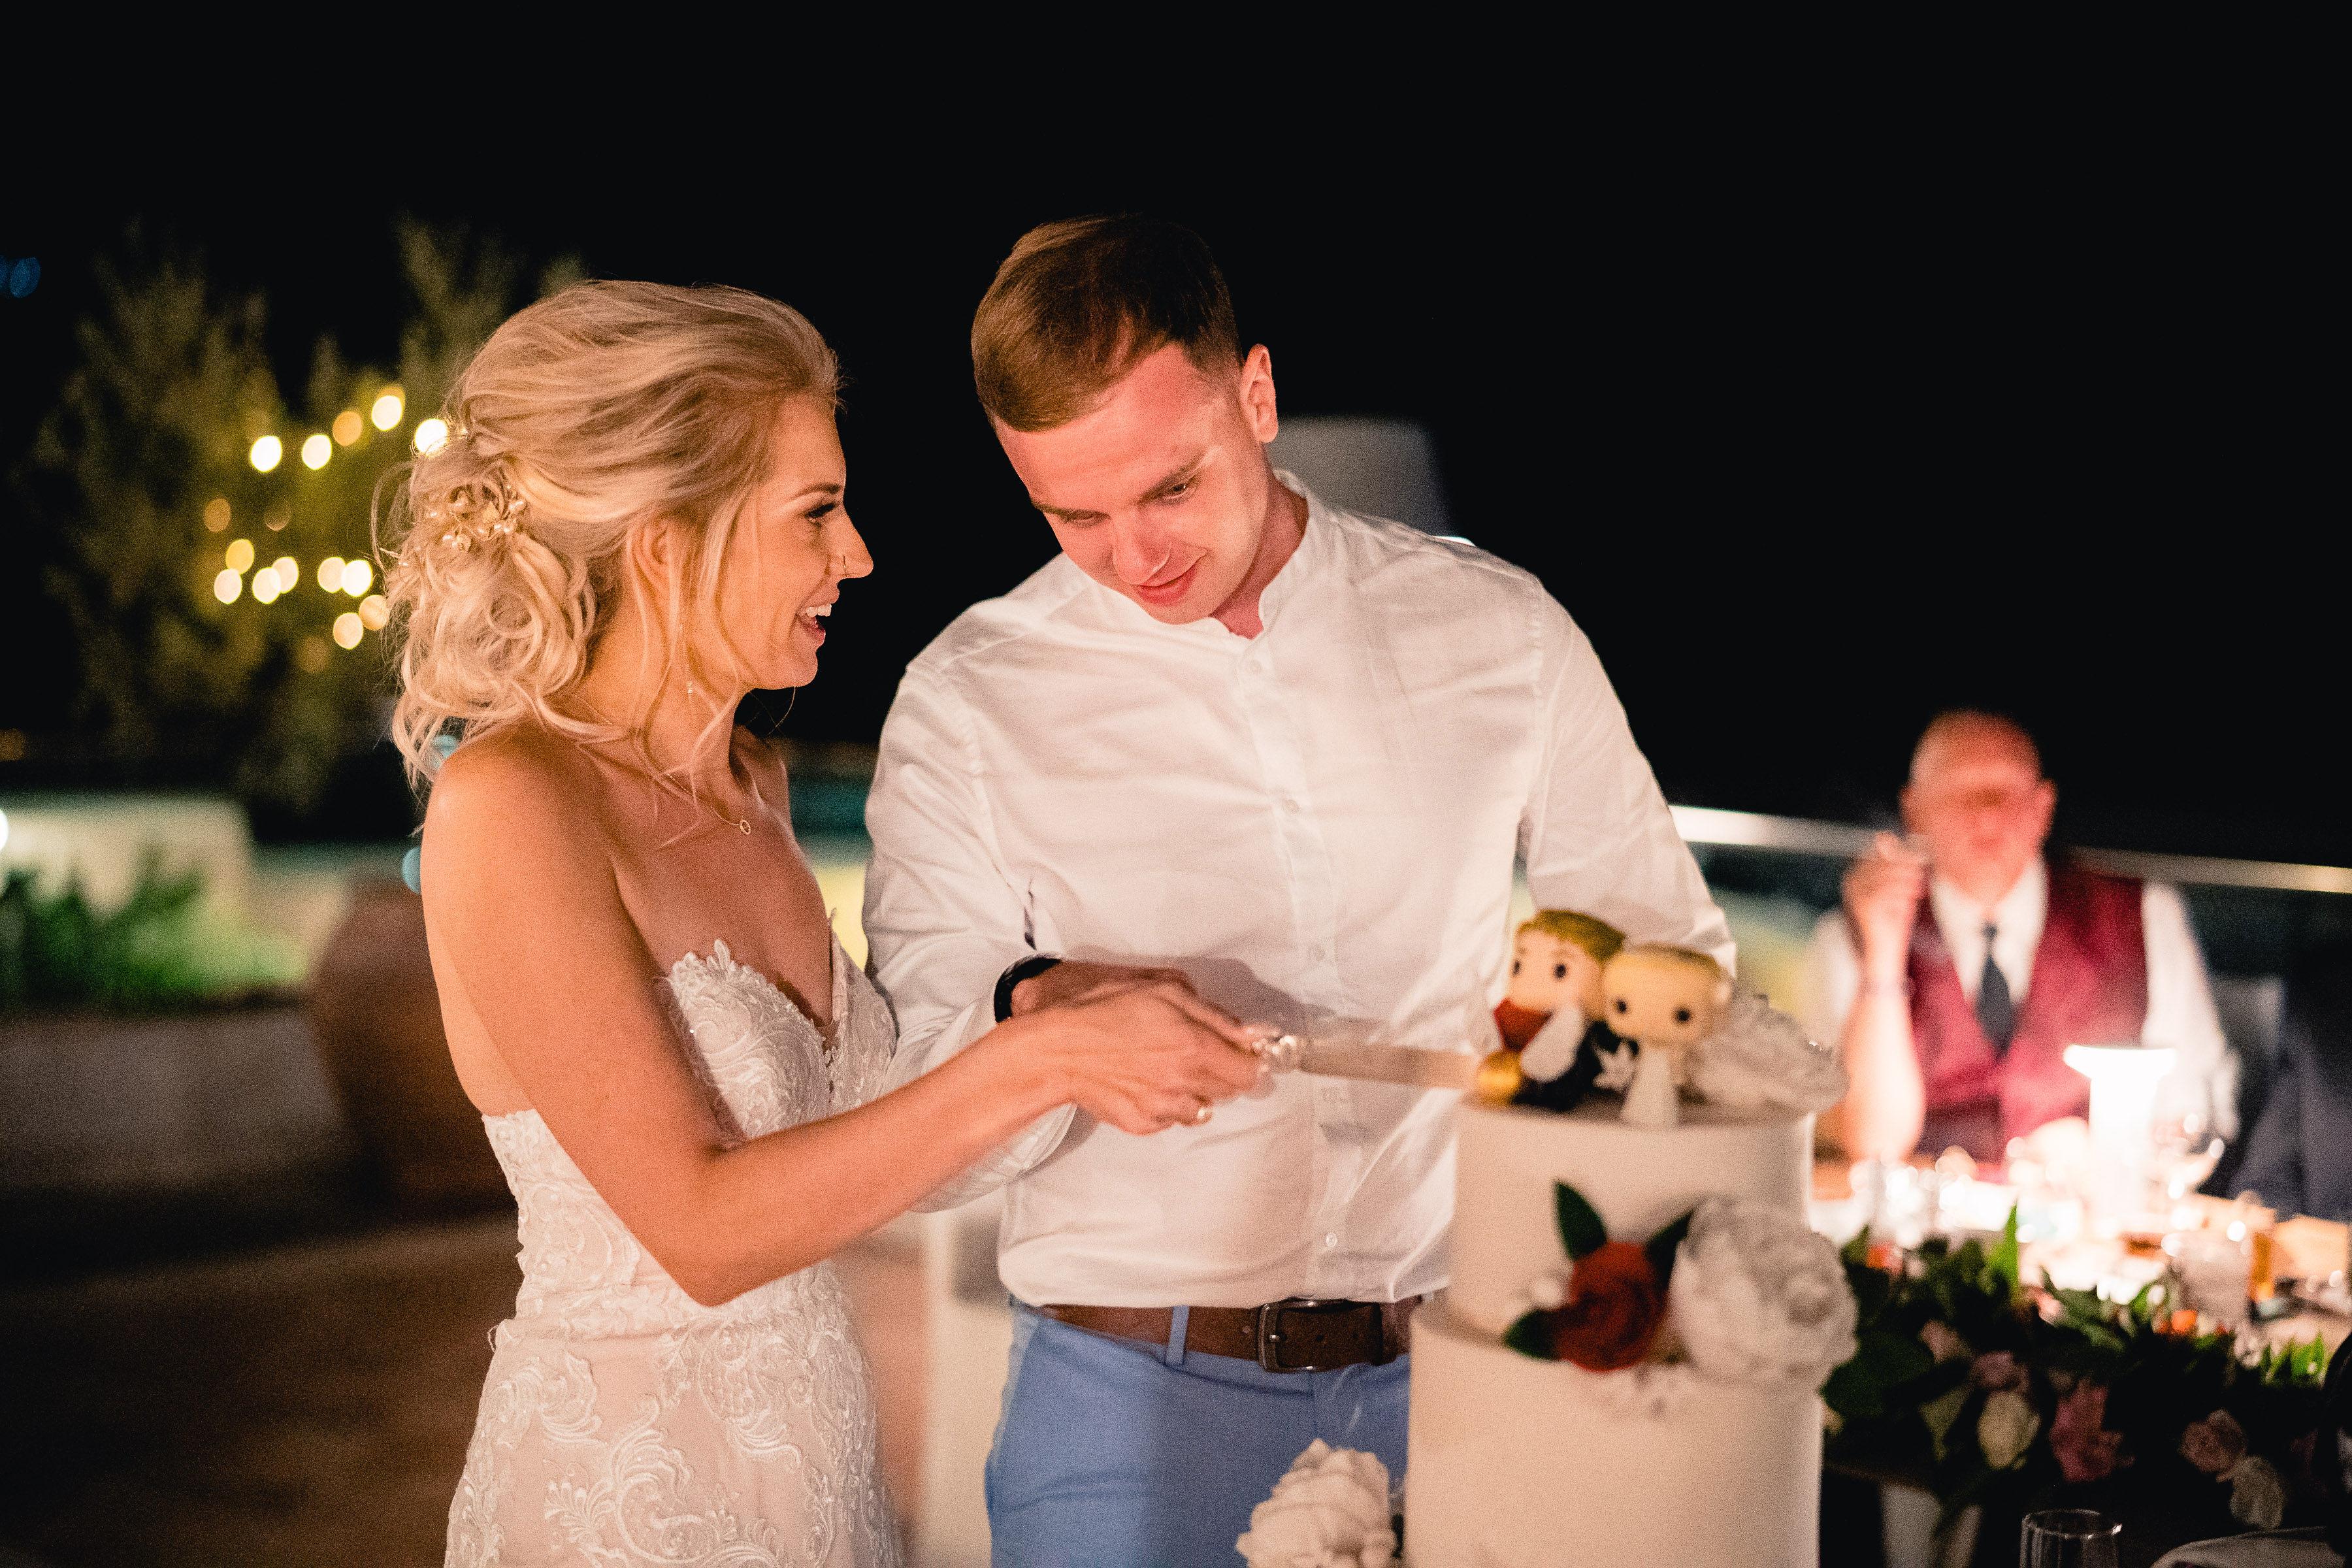 Jara&Alistair-Porto-Angeli-Wedding-472